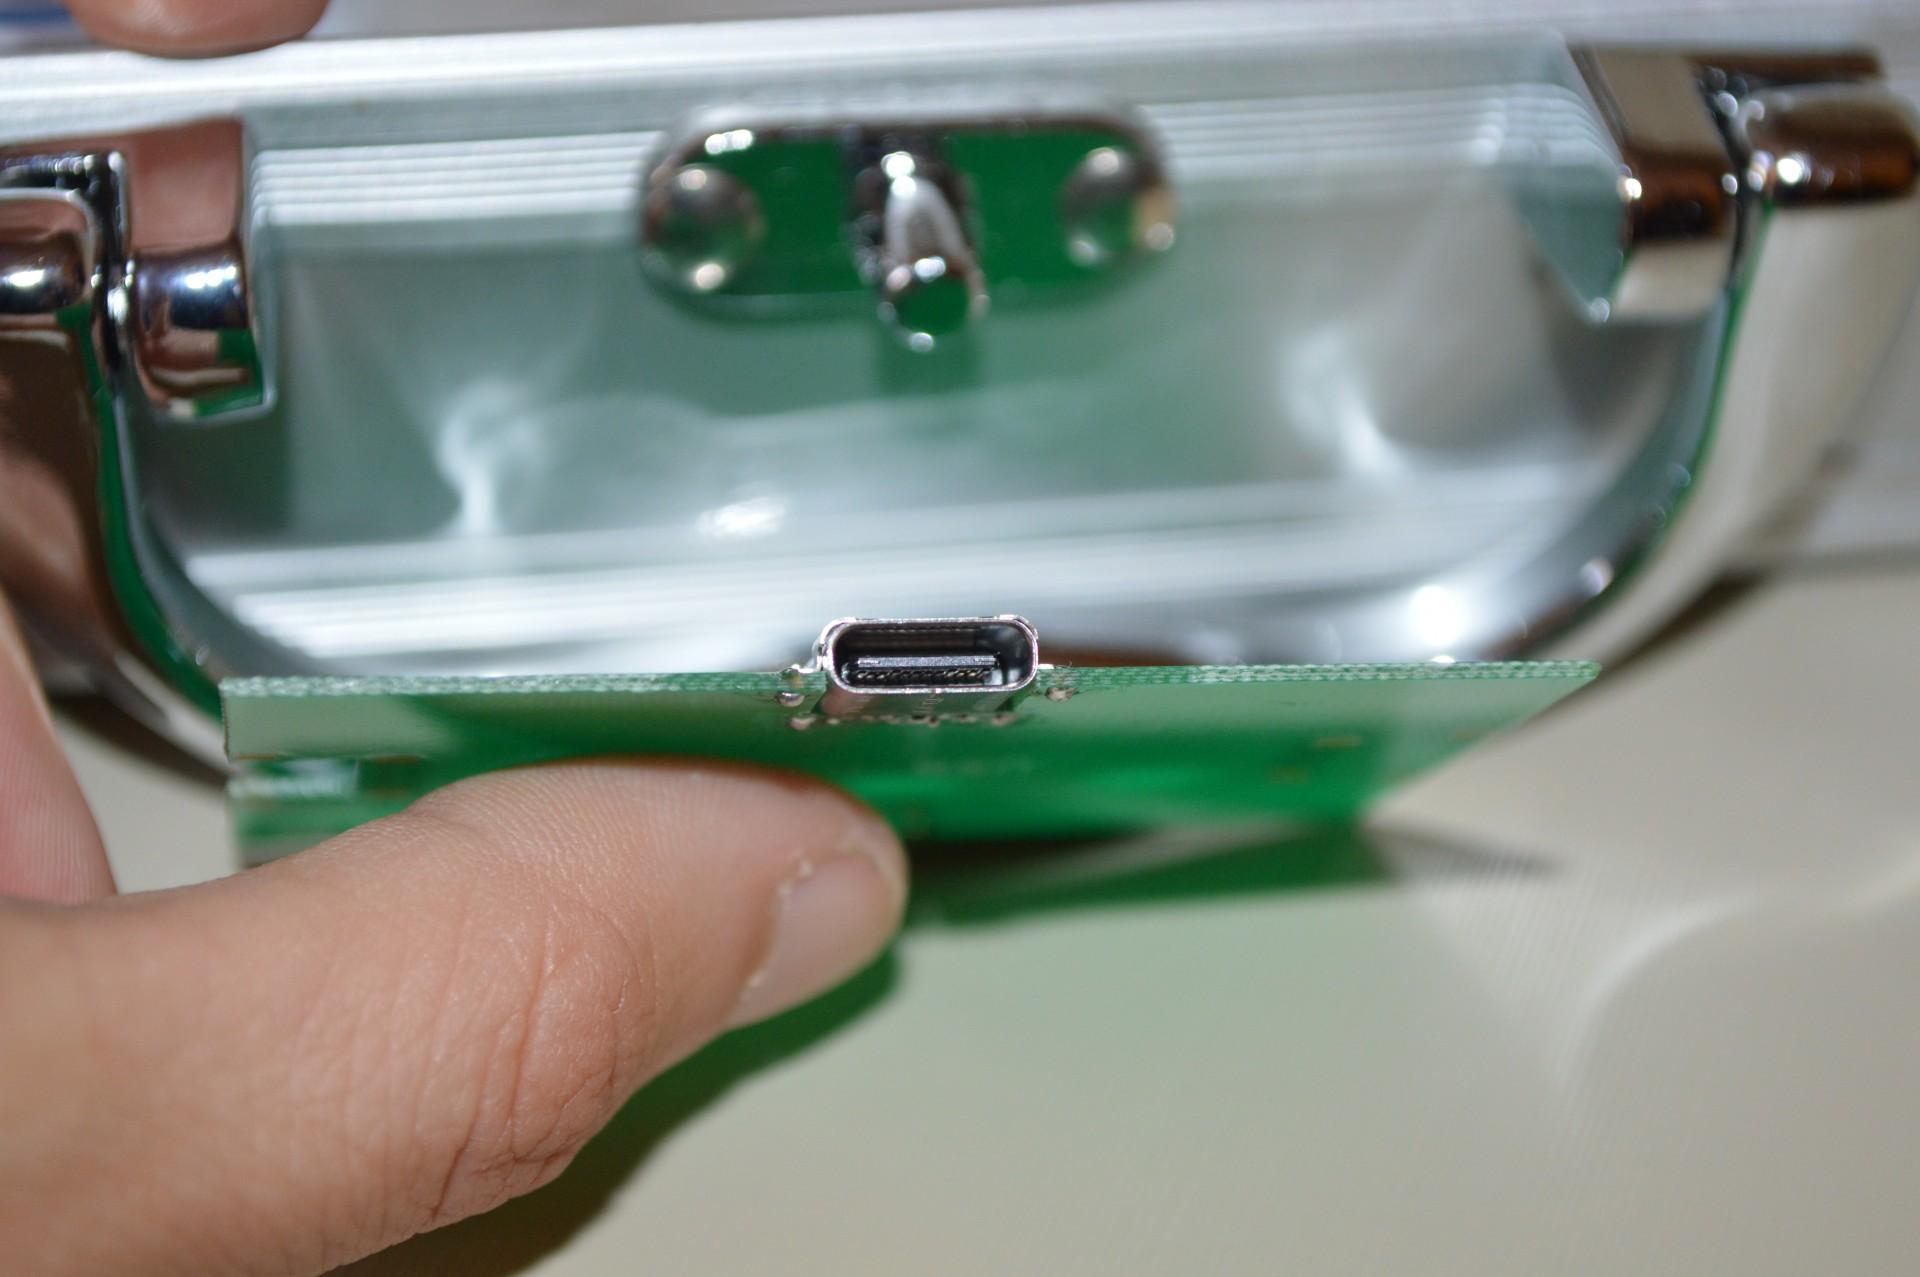 samsung galaxy note 5 - Samsung Galaxy Note 5 sẽ có cổng USB Type-C